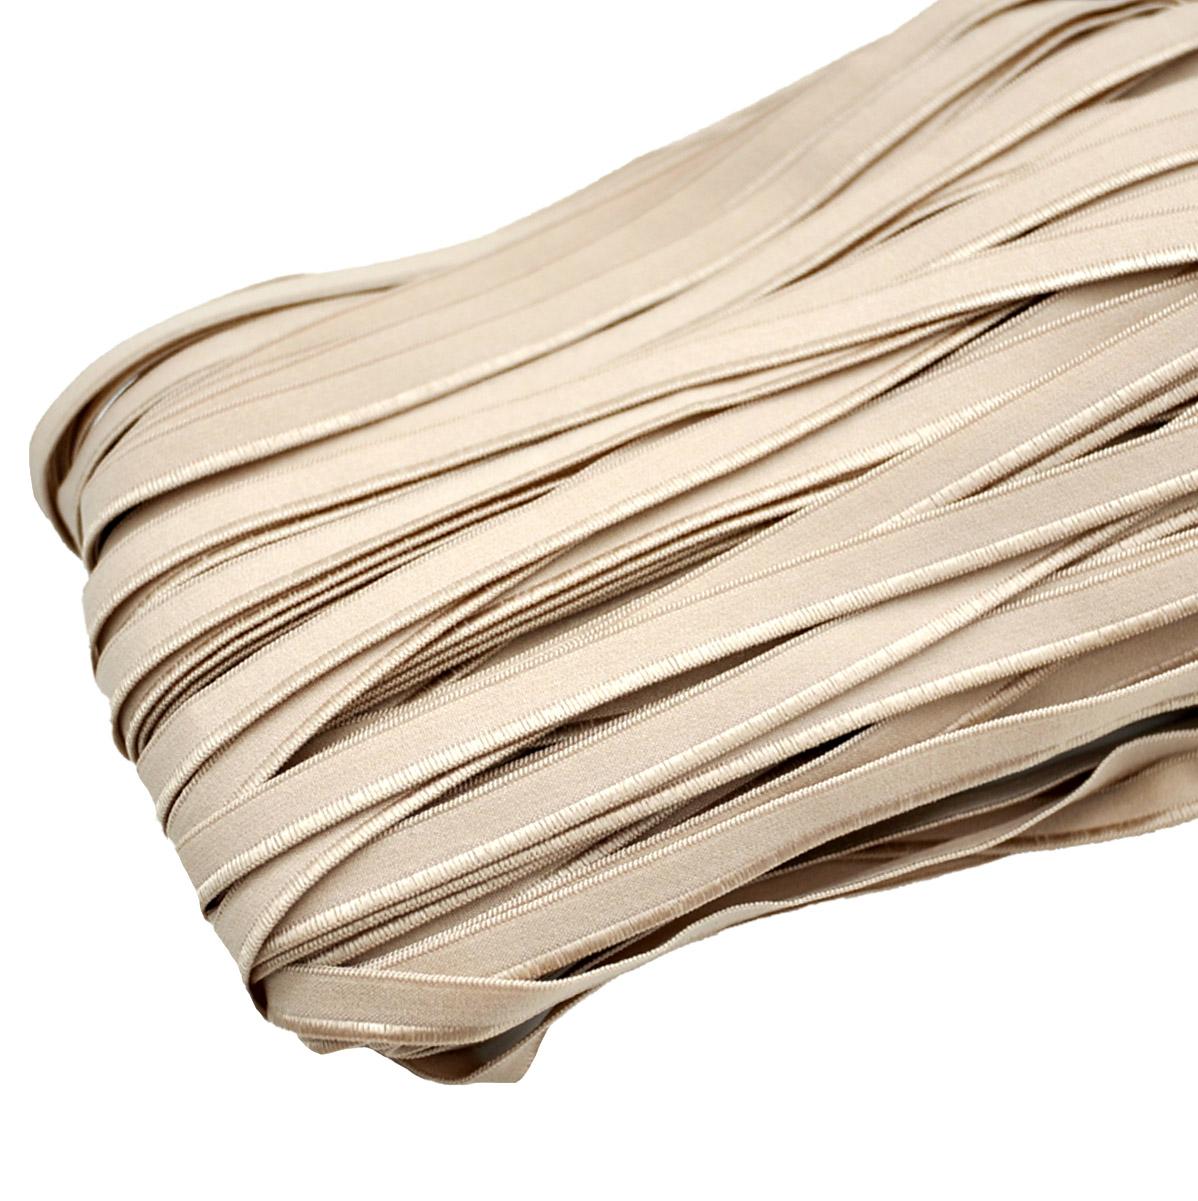 STD/100 эластичная отделочная лента 8мм*50м, светлый серо-бежевый